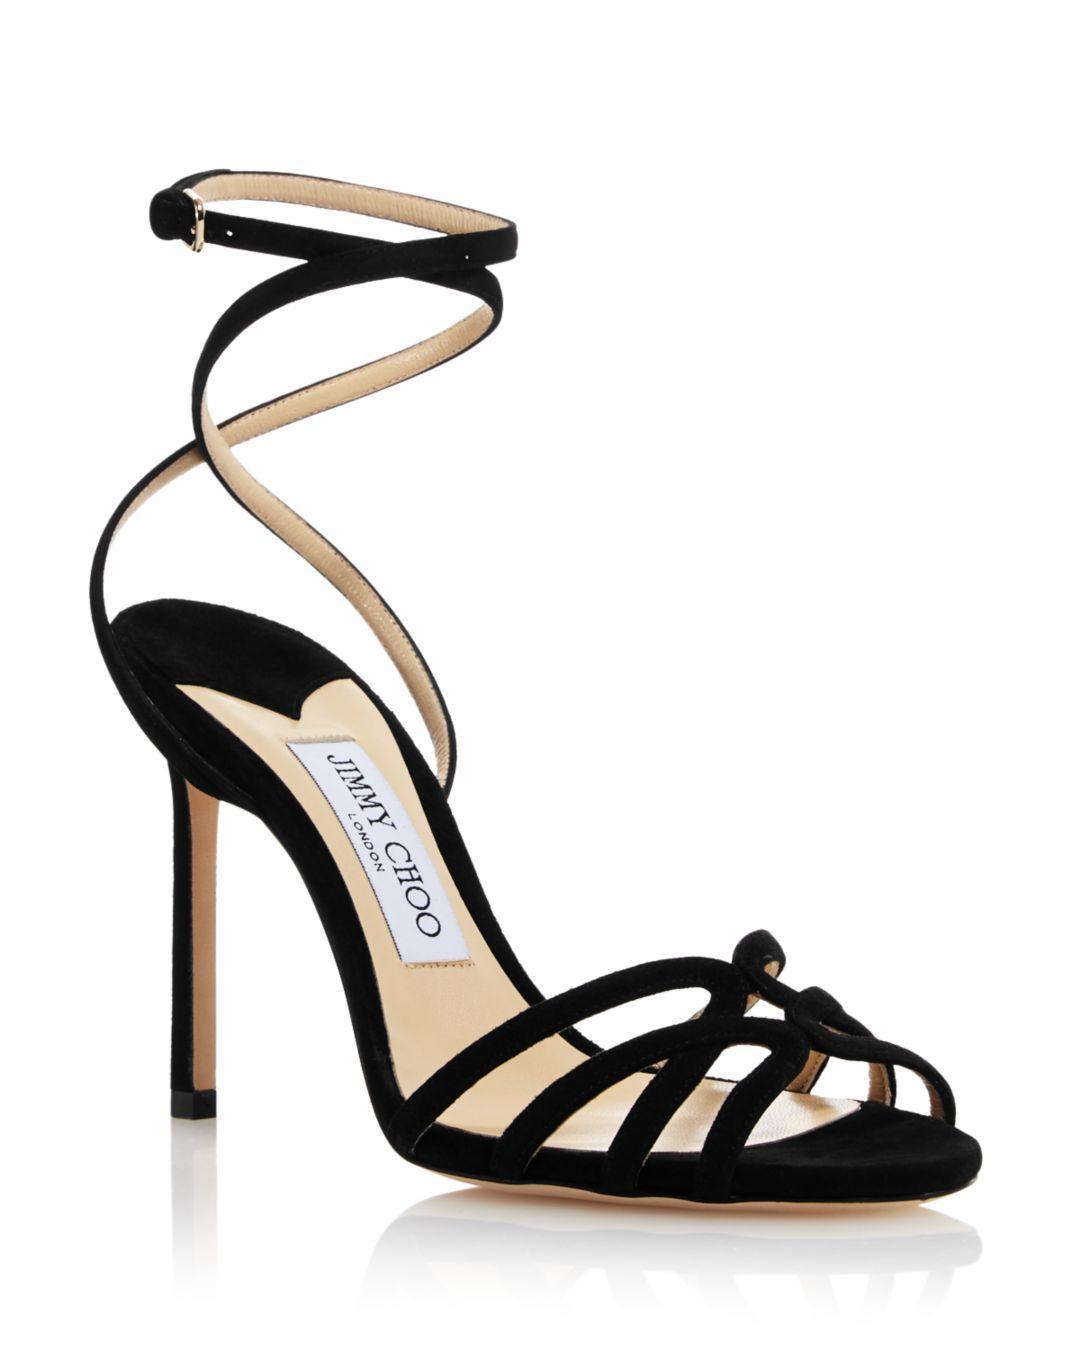 5e2ef01791e8 Jimmy Choo - Black Women s Mimi 100 High-heel Sandals - Lyst. View  fullscreen